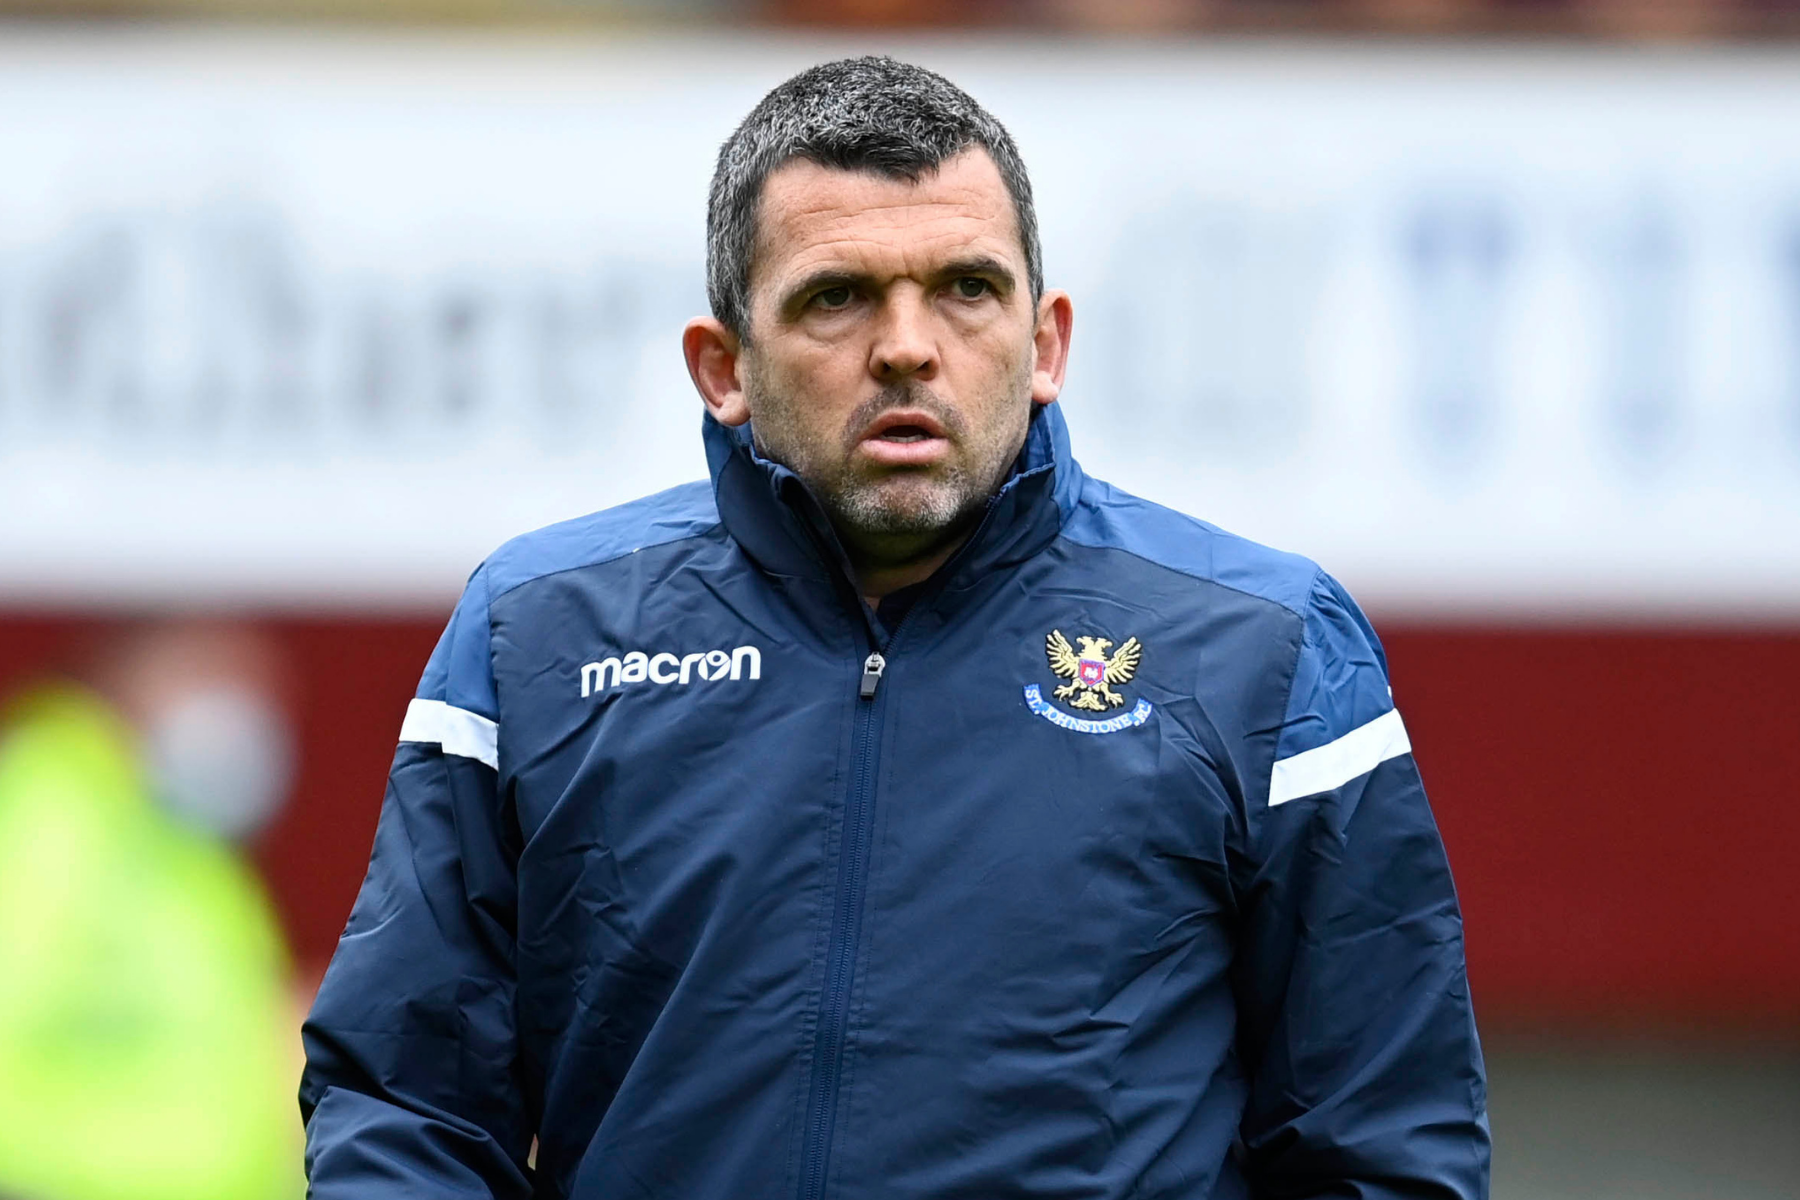 Betfred Cup goals can kick-start St Johnstone's season, says Callum Davidson